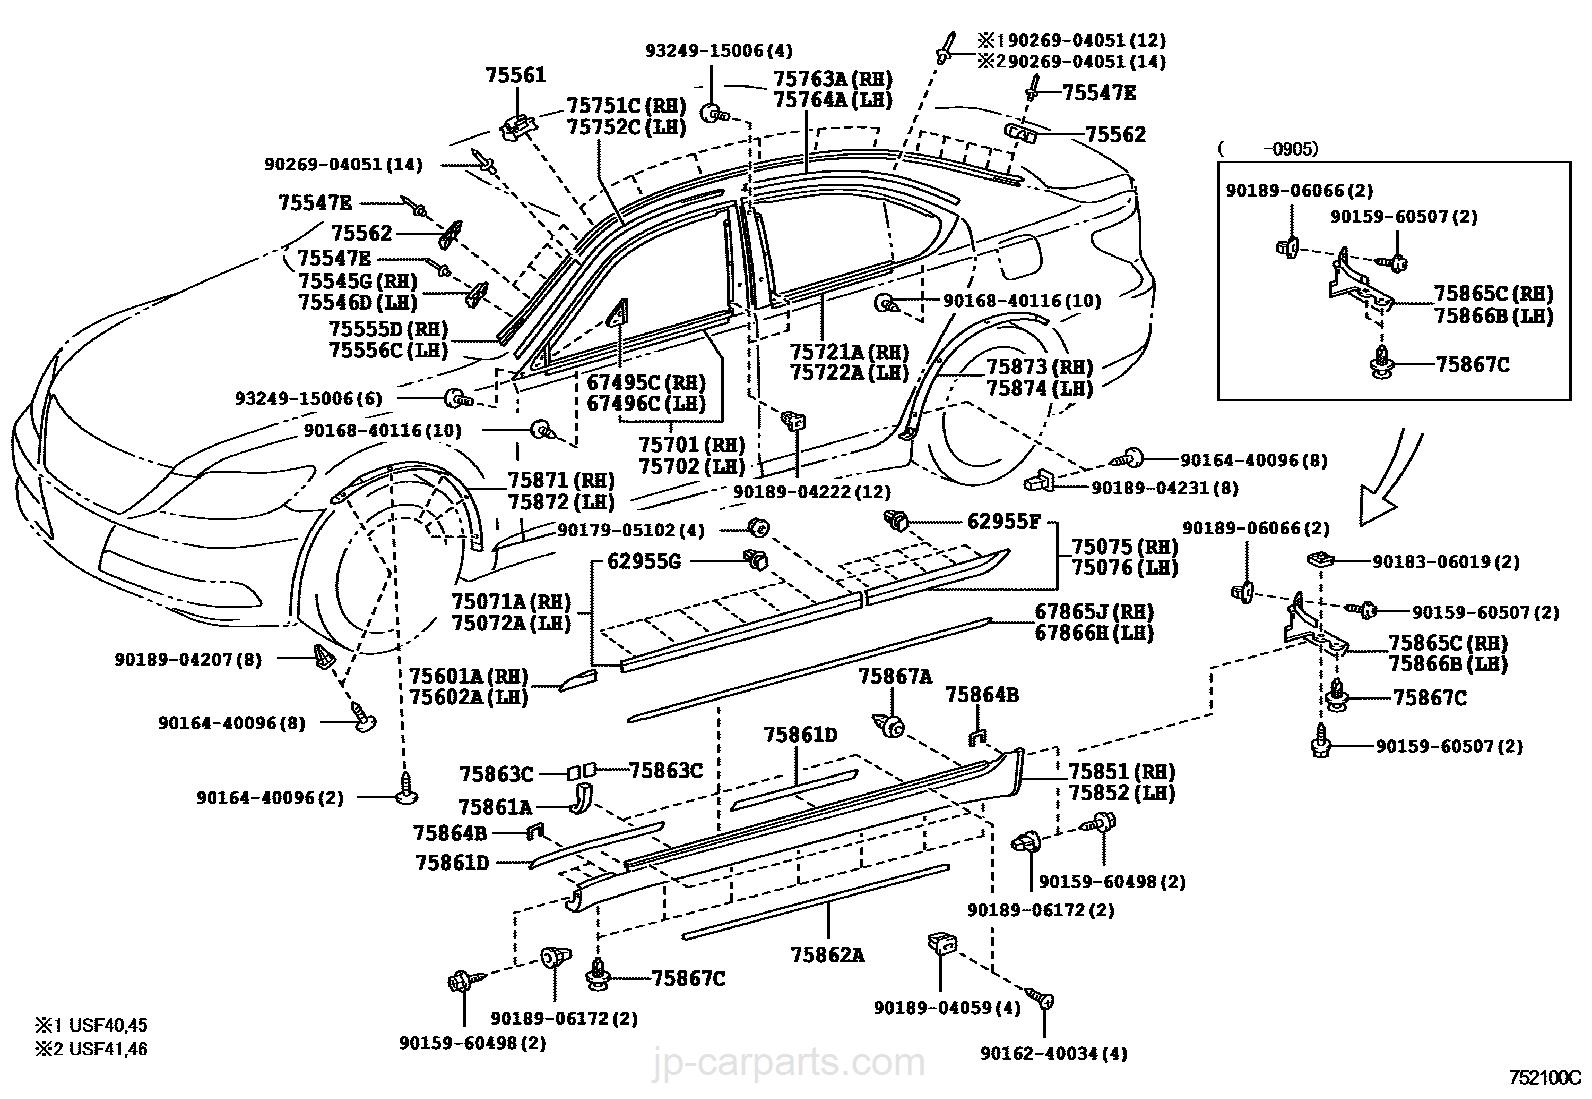 Car parts in spanish quizlet 15